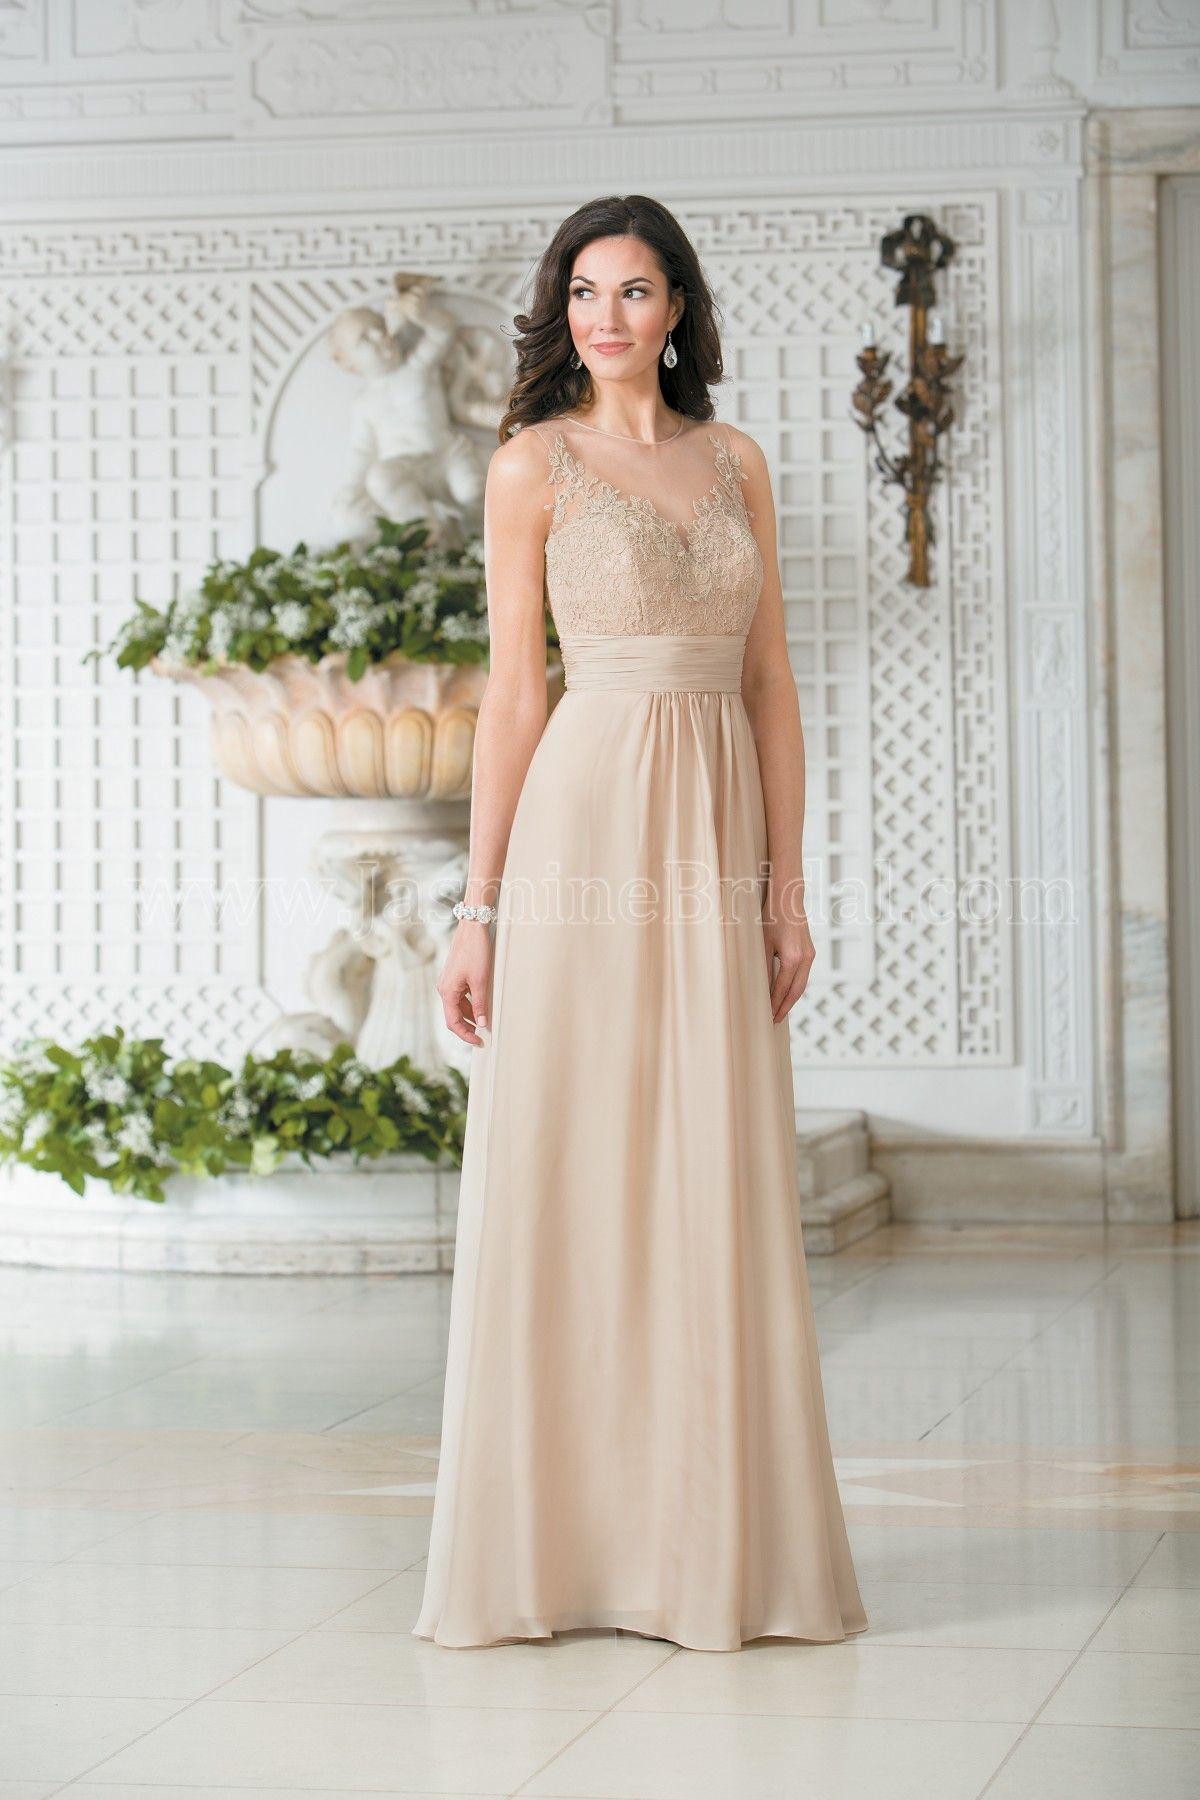 Jasmine wedding dresses  Jasmine Bridal  Belsoie Style L in LaceAmber Satin Chiffon